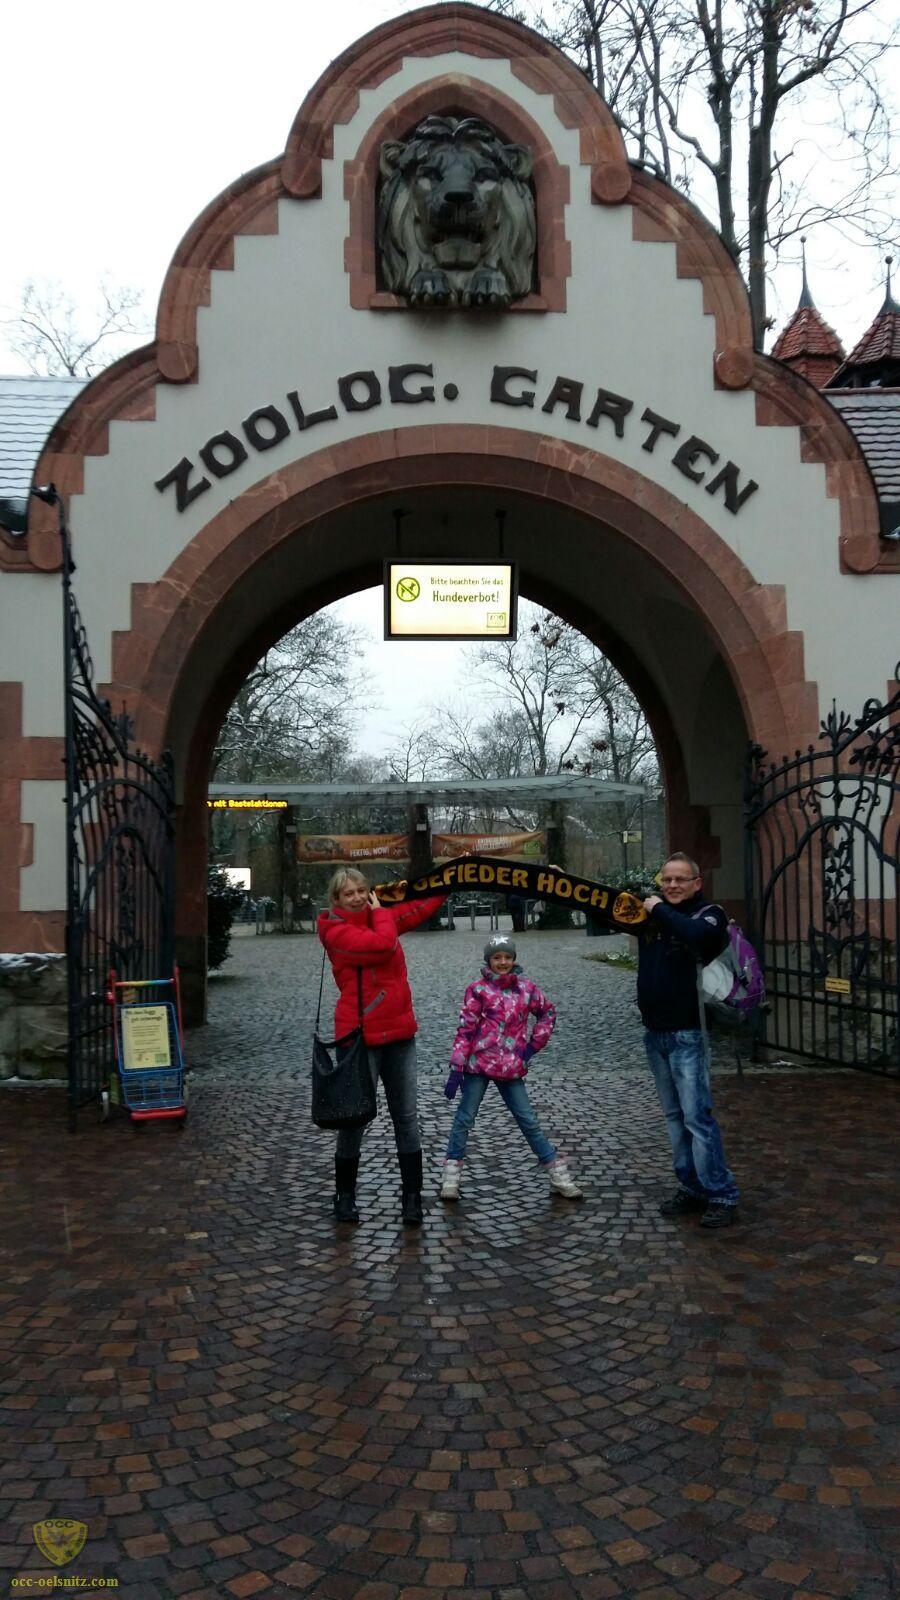 Zoo Leipzig, 178 km